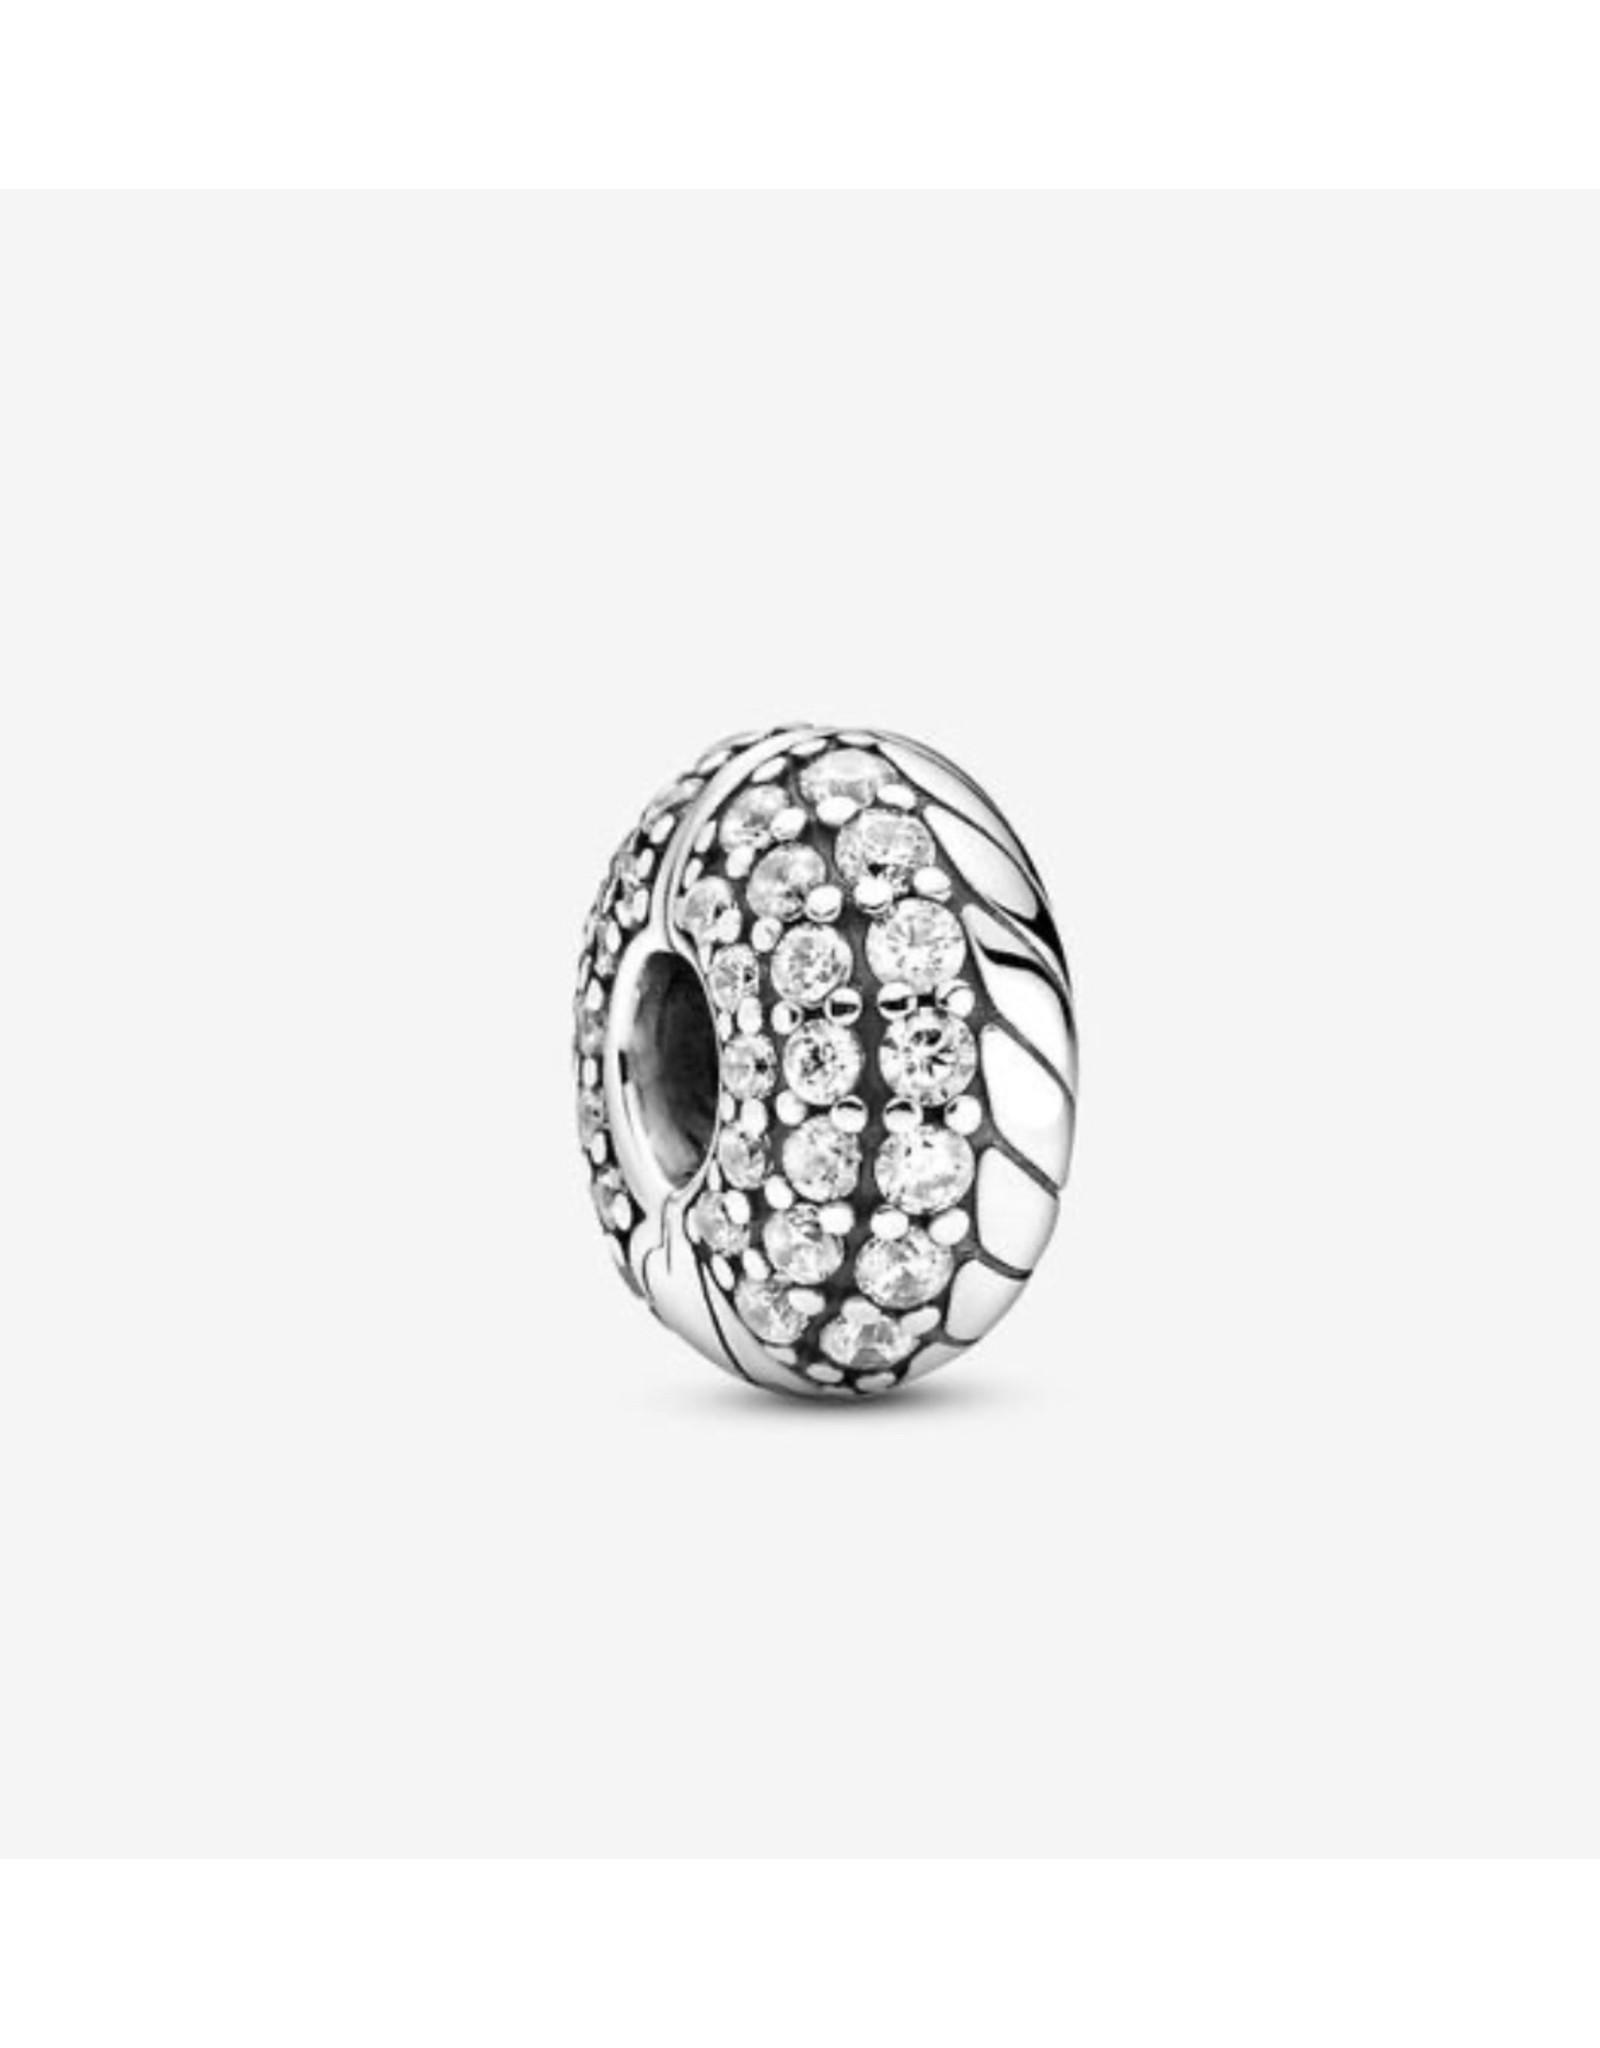 Pandora Pandora Clip,799089C01, Pave Snake Chain Pattern, Clip, Clear CZ